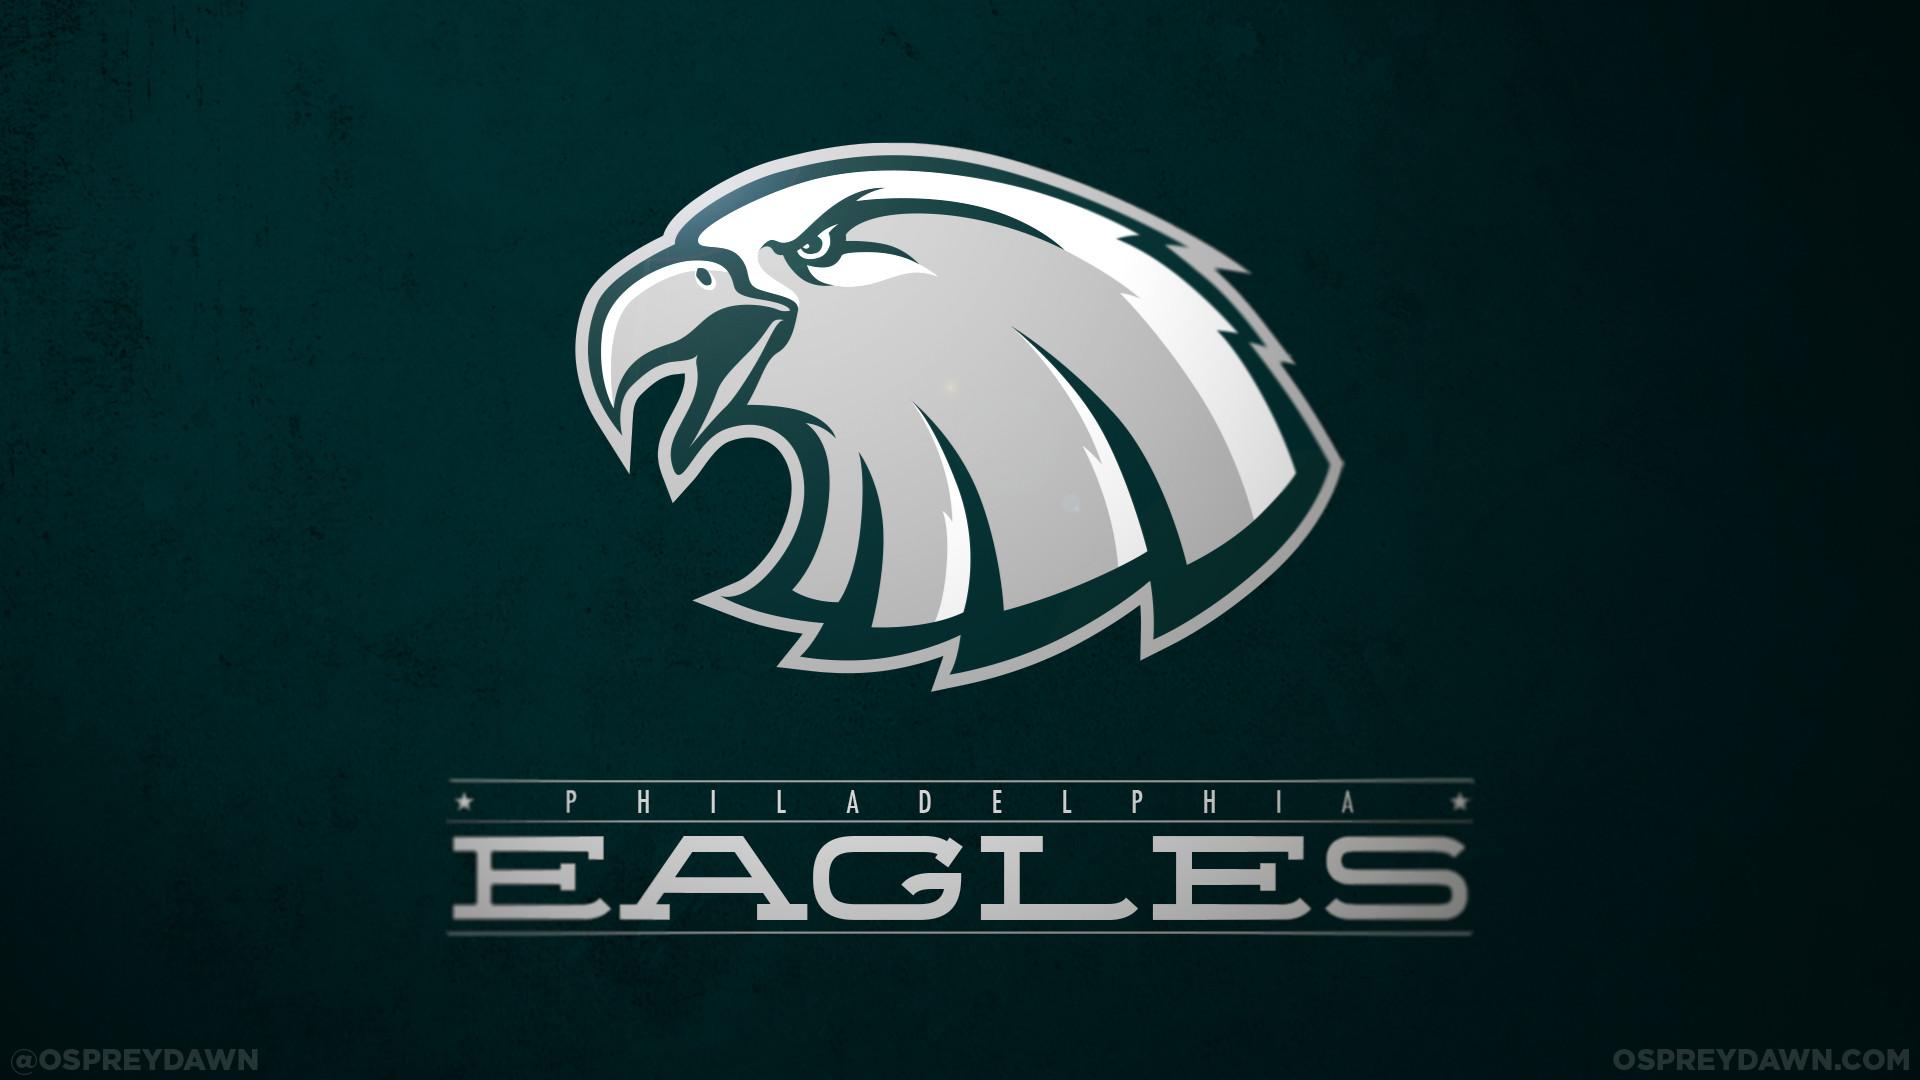 The Philadelphia Eagles – Osprey Dawn